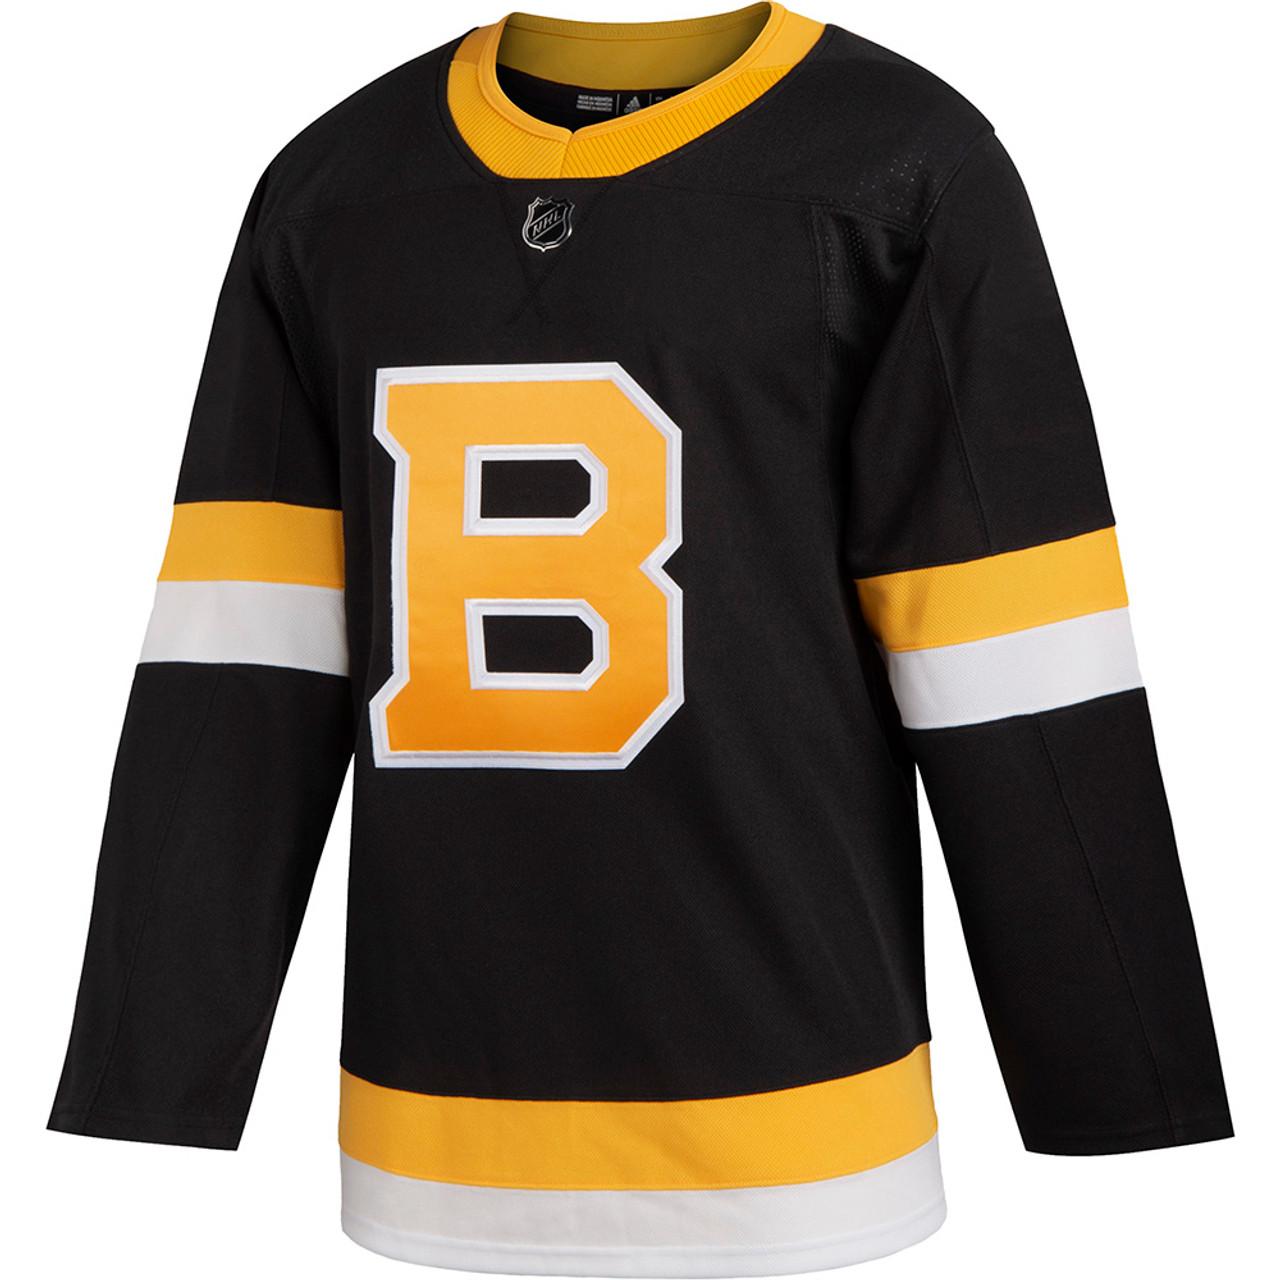 Boston Bruins shirt t-shirt tee Baby jersey Newest personalized customized